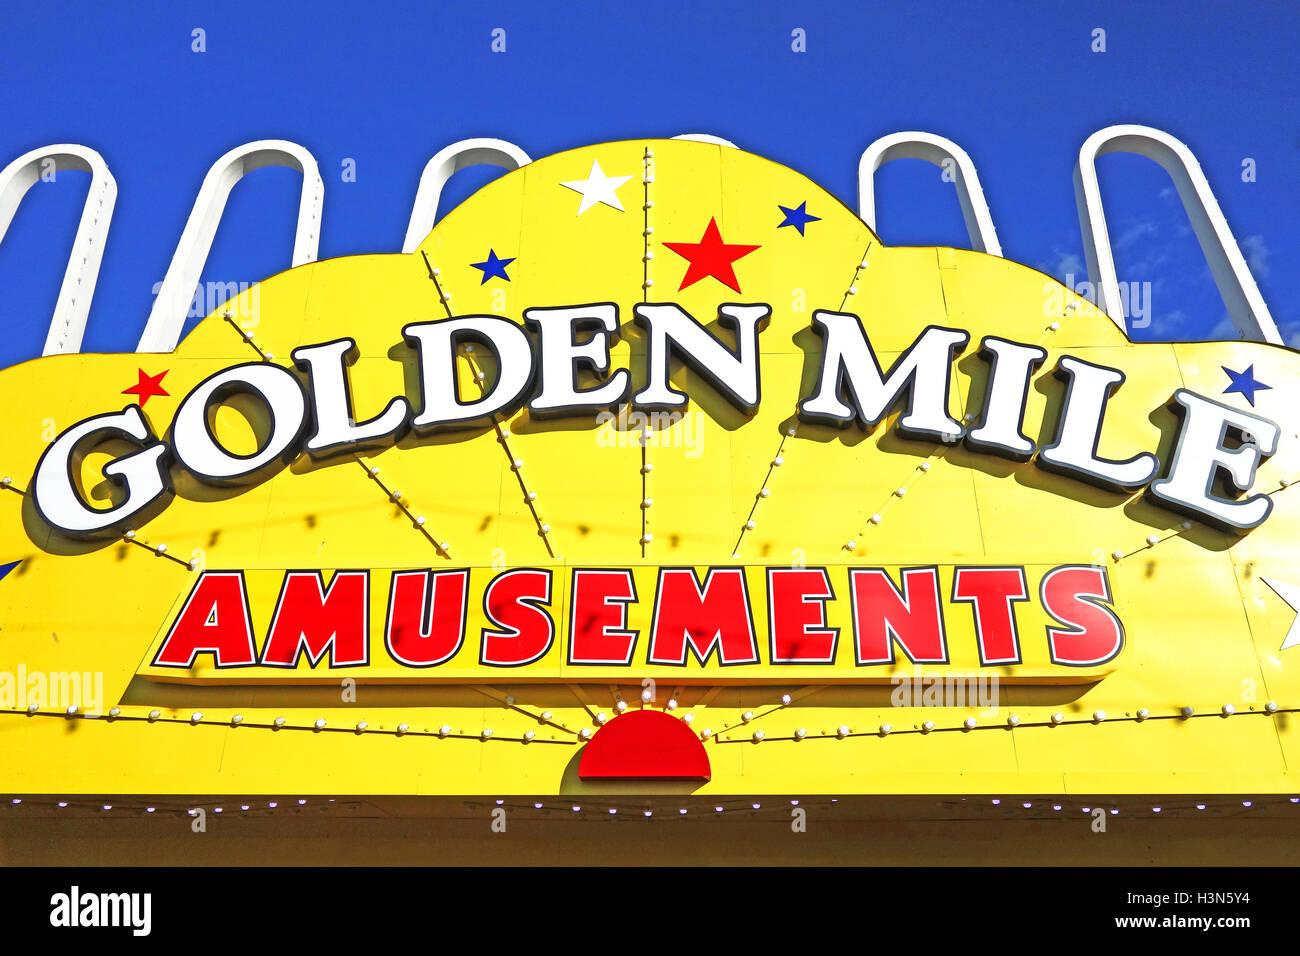 Golden Mile amusements arcade in Blackpool, Lancashire, England, UK - Stock Image